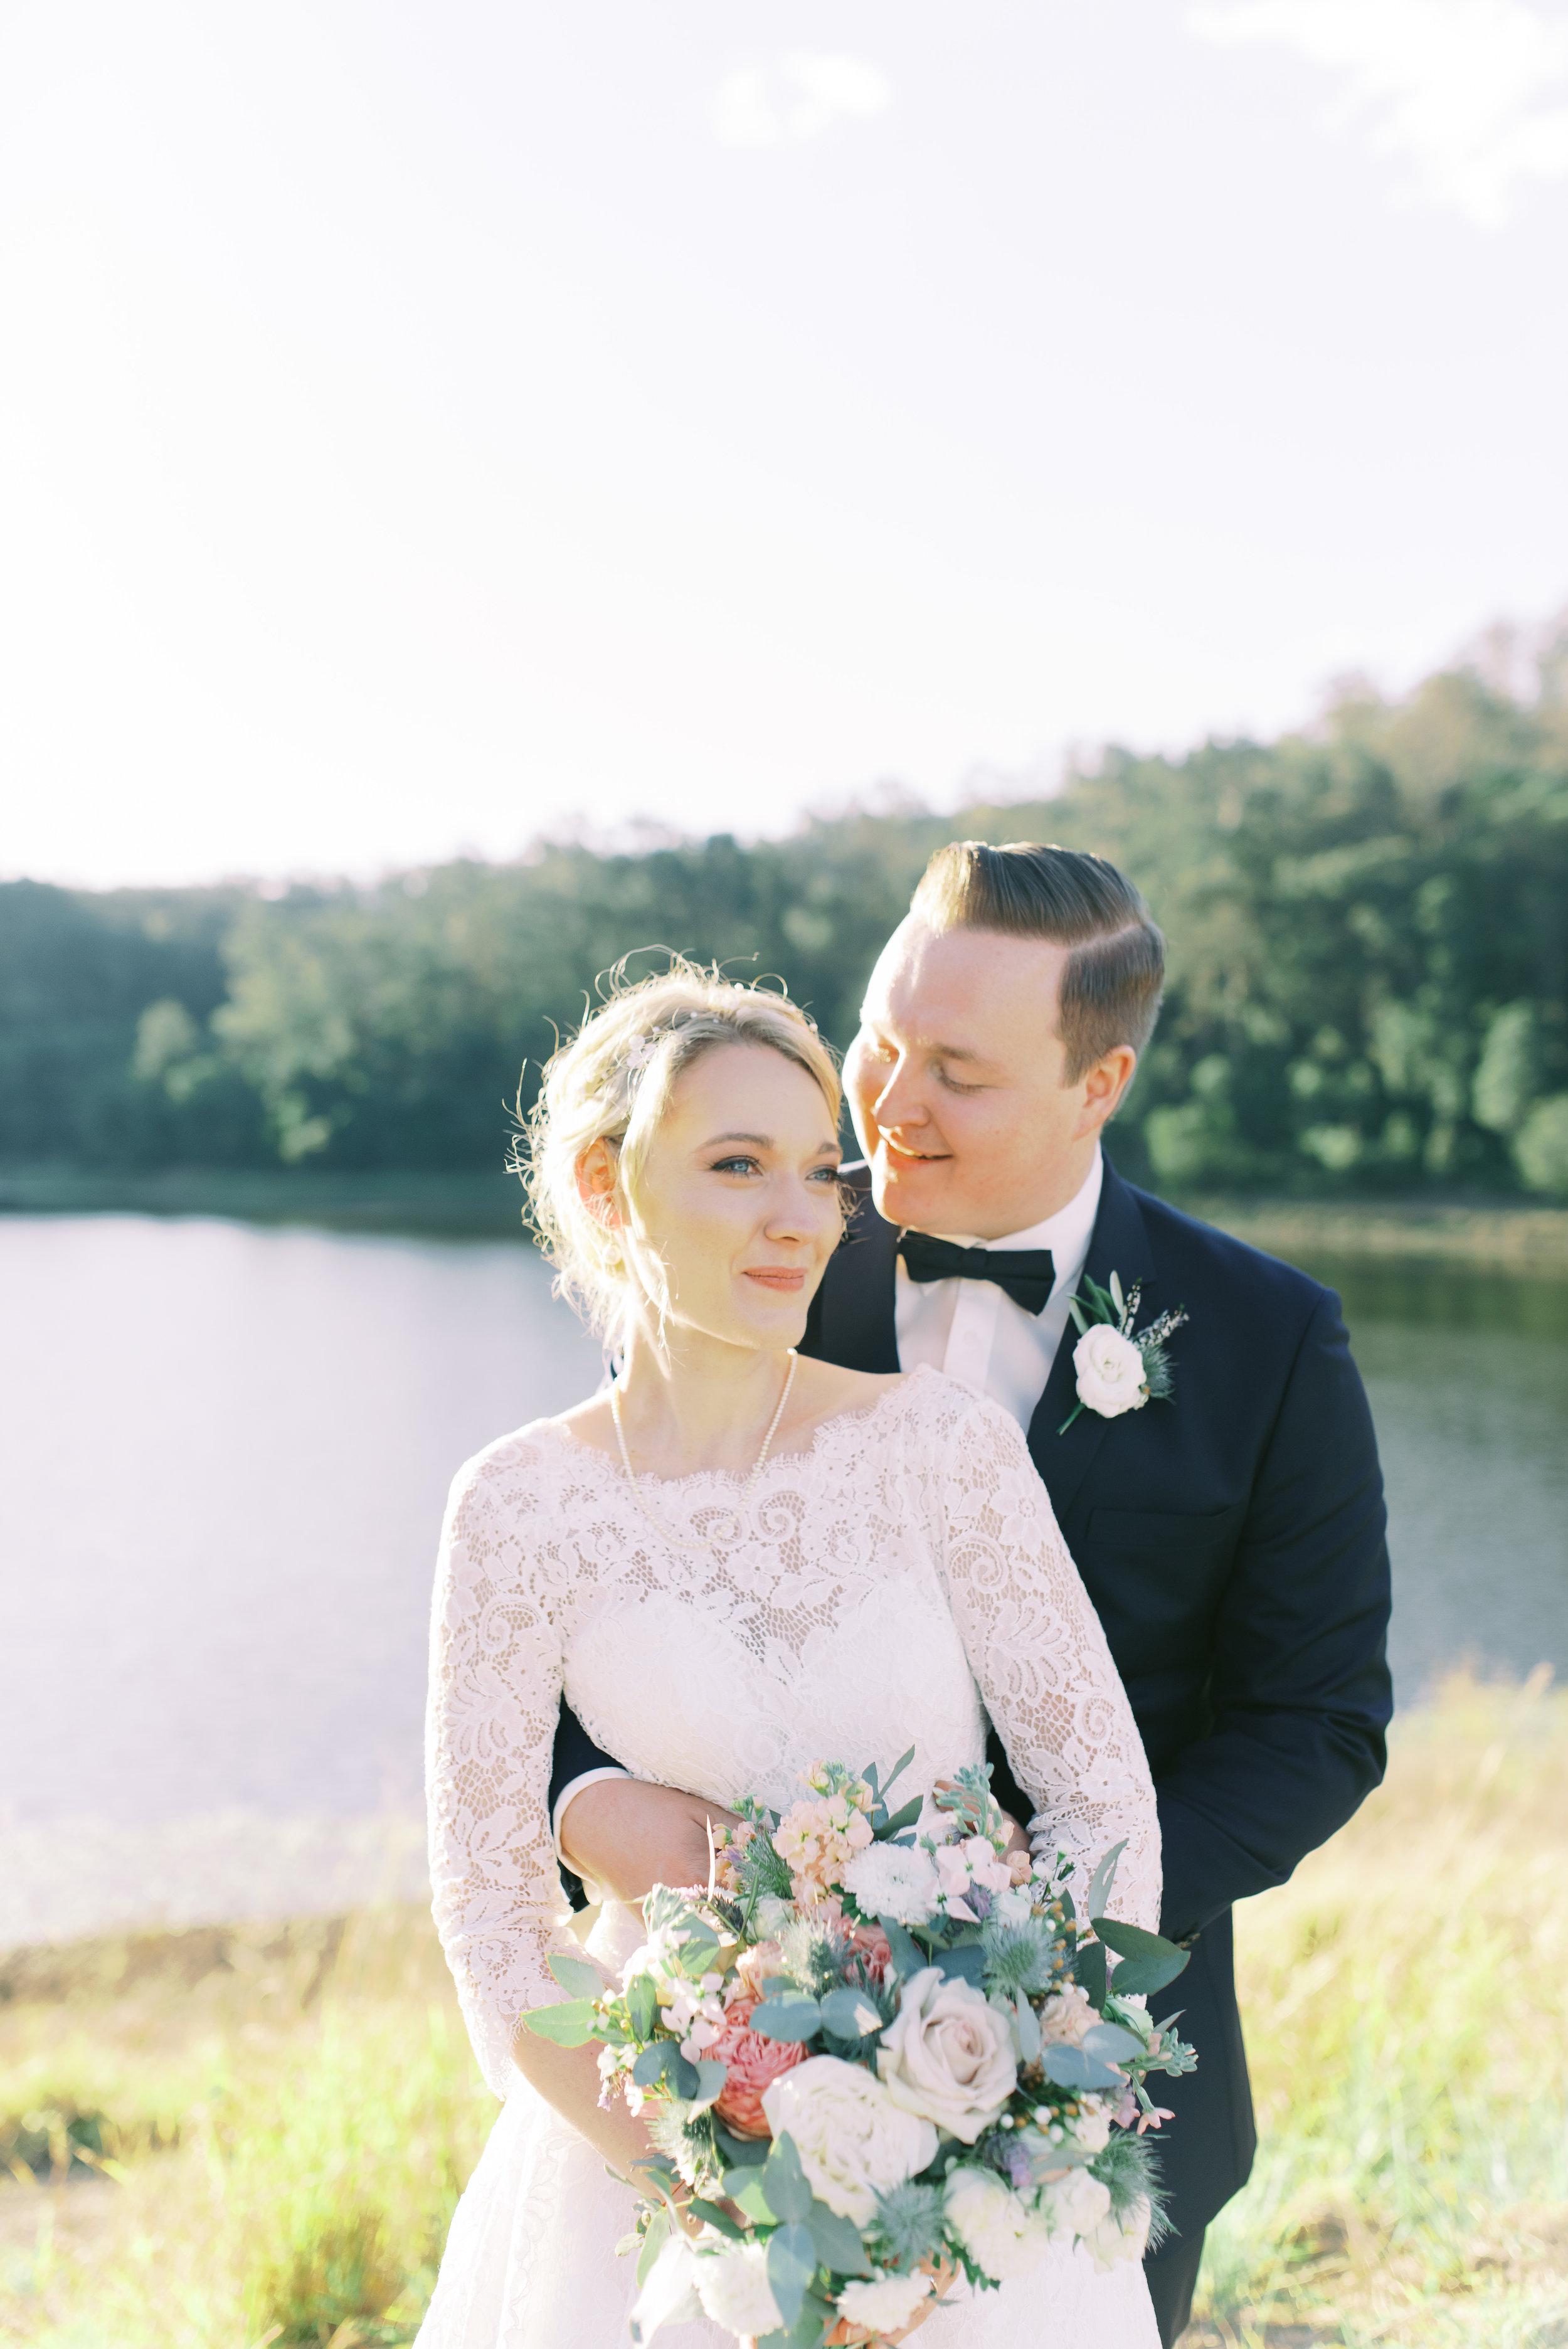 brisbane-gold-coast-sunshine-coast-tweed-romantic-fine-art-wedding-photography-lauren-olivia-43.jpg